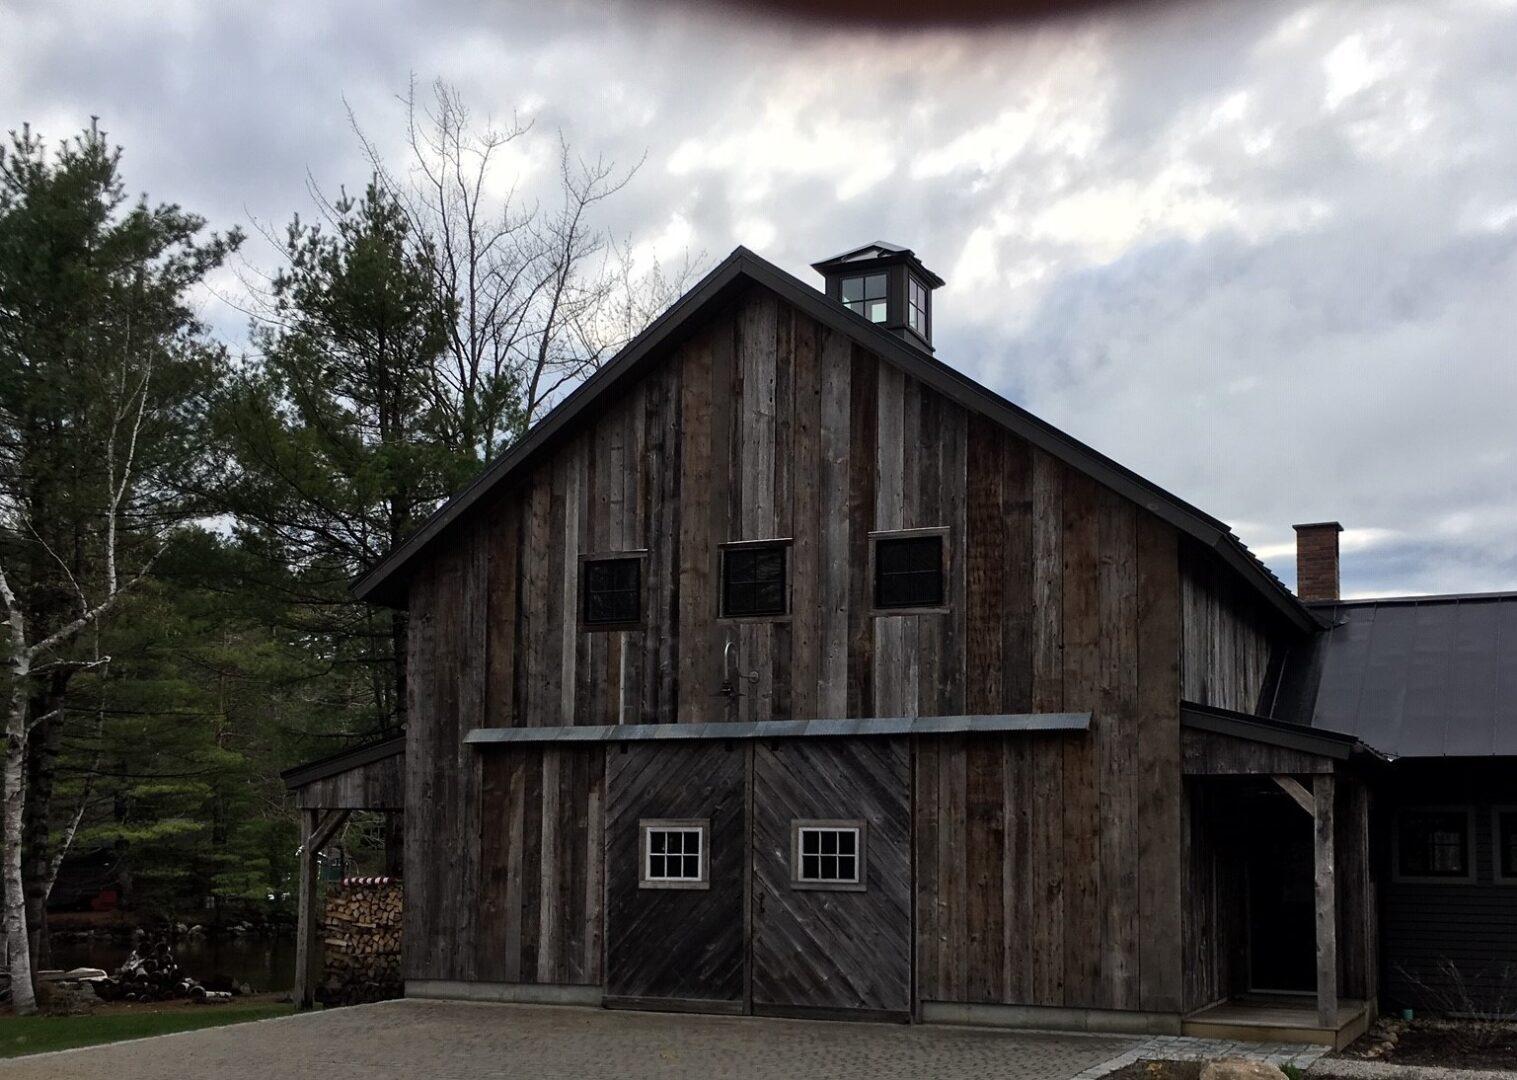 Renovated garage with upstairs Game Room using seasoned barn boards